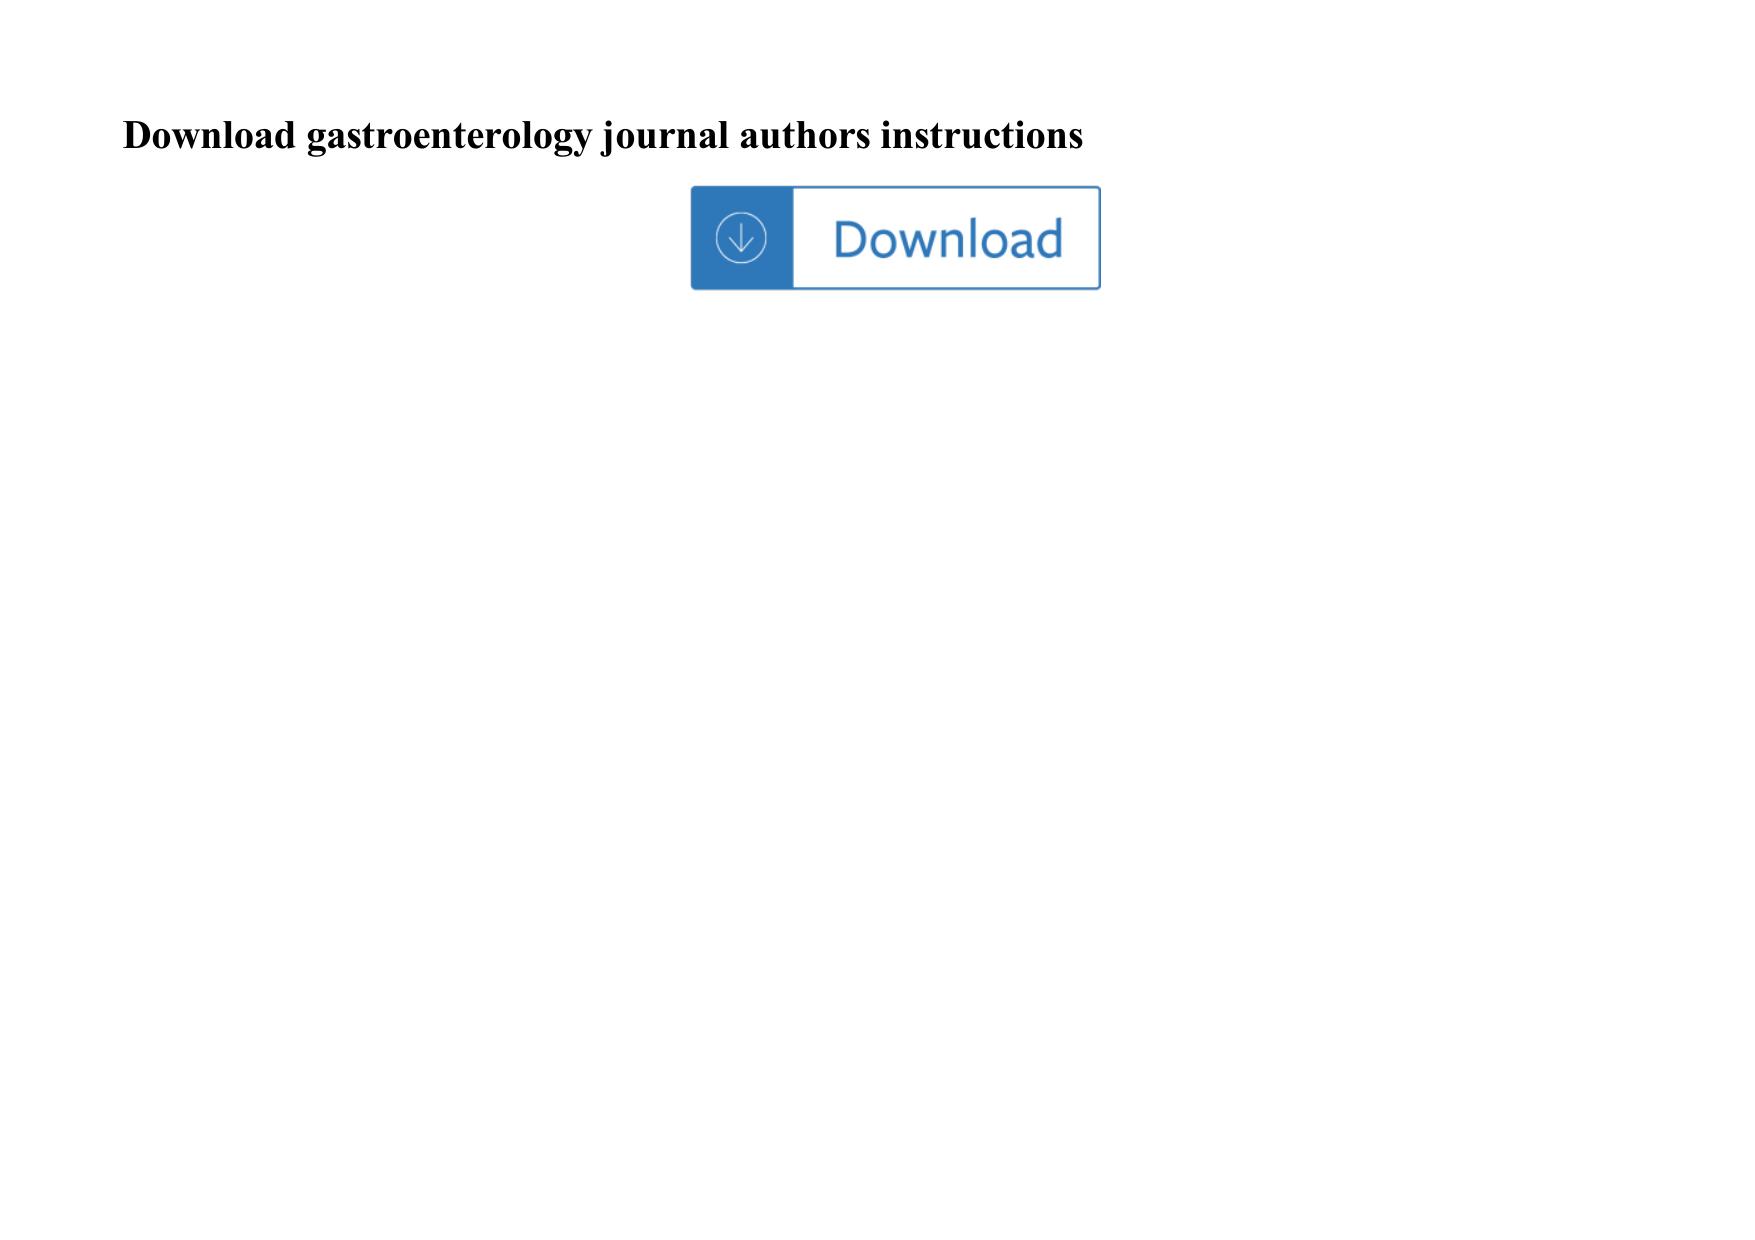 Gastroenterology Journal Authors Instructions